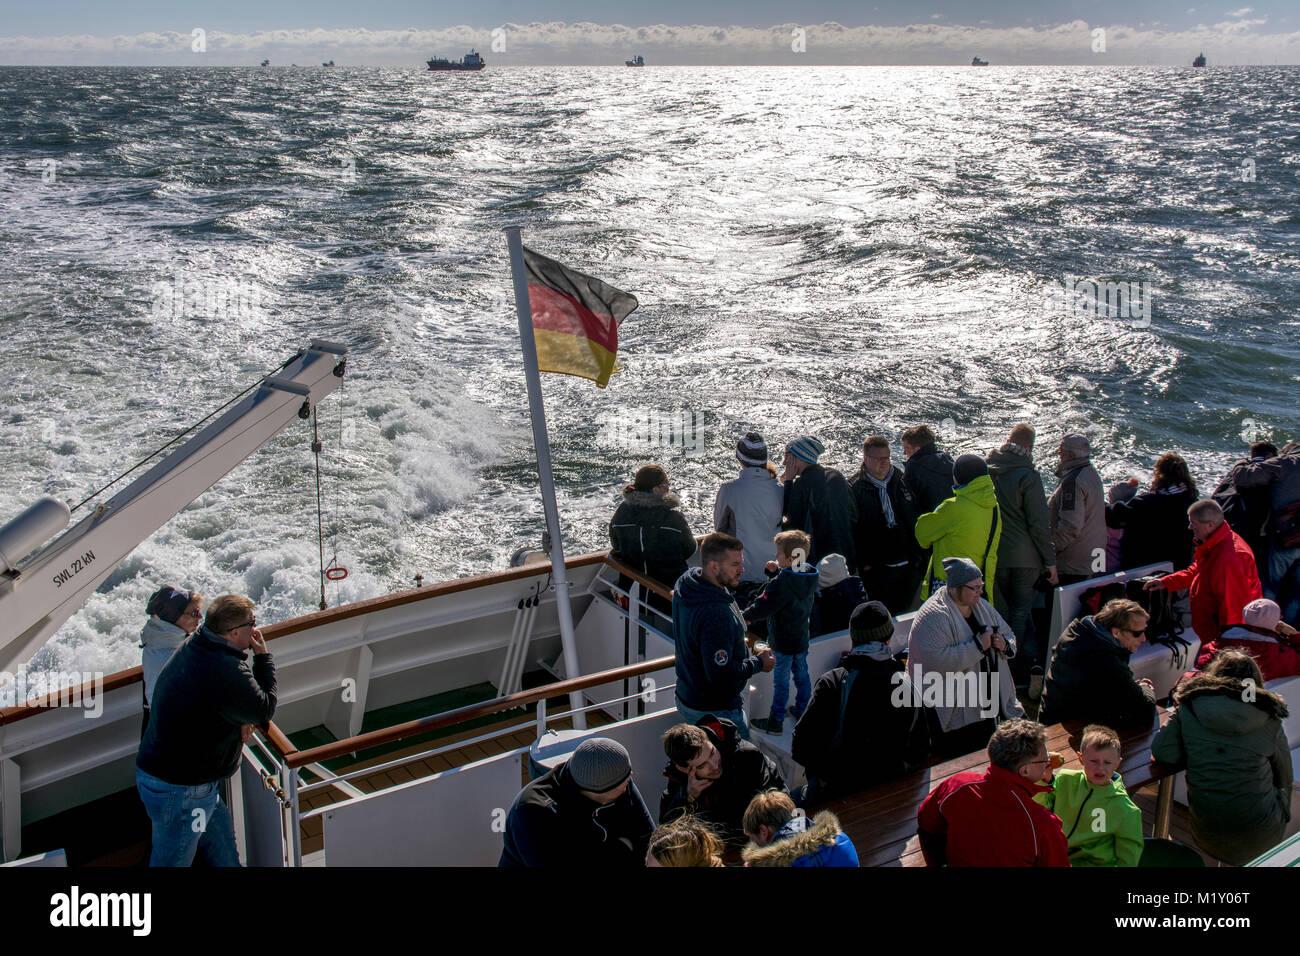 "On the way to Helgoland, the German island in the Northsea. Schiffsausflug nach Helgoland mit der ""MS Helgoland"" Stock Photo"